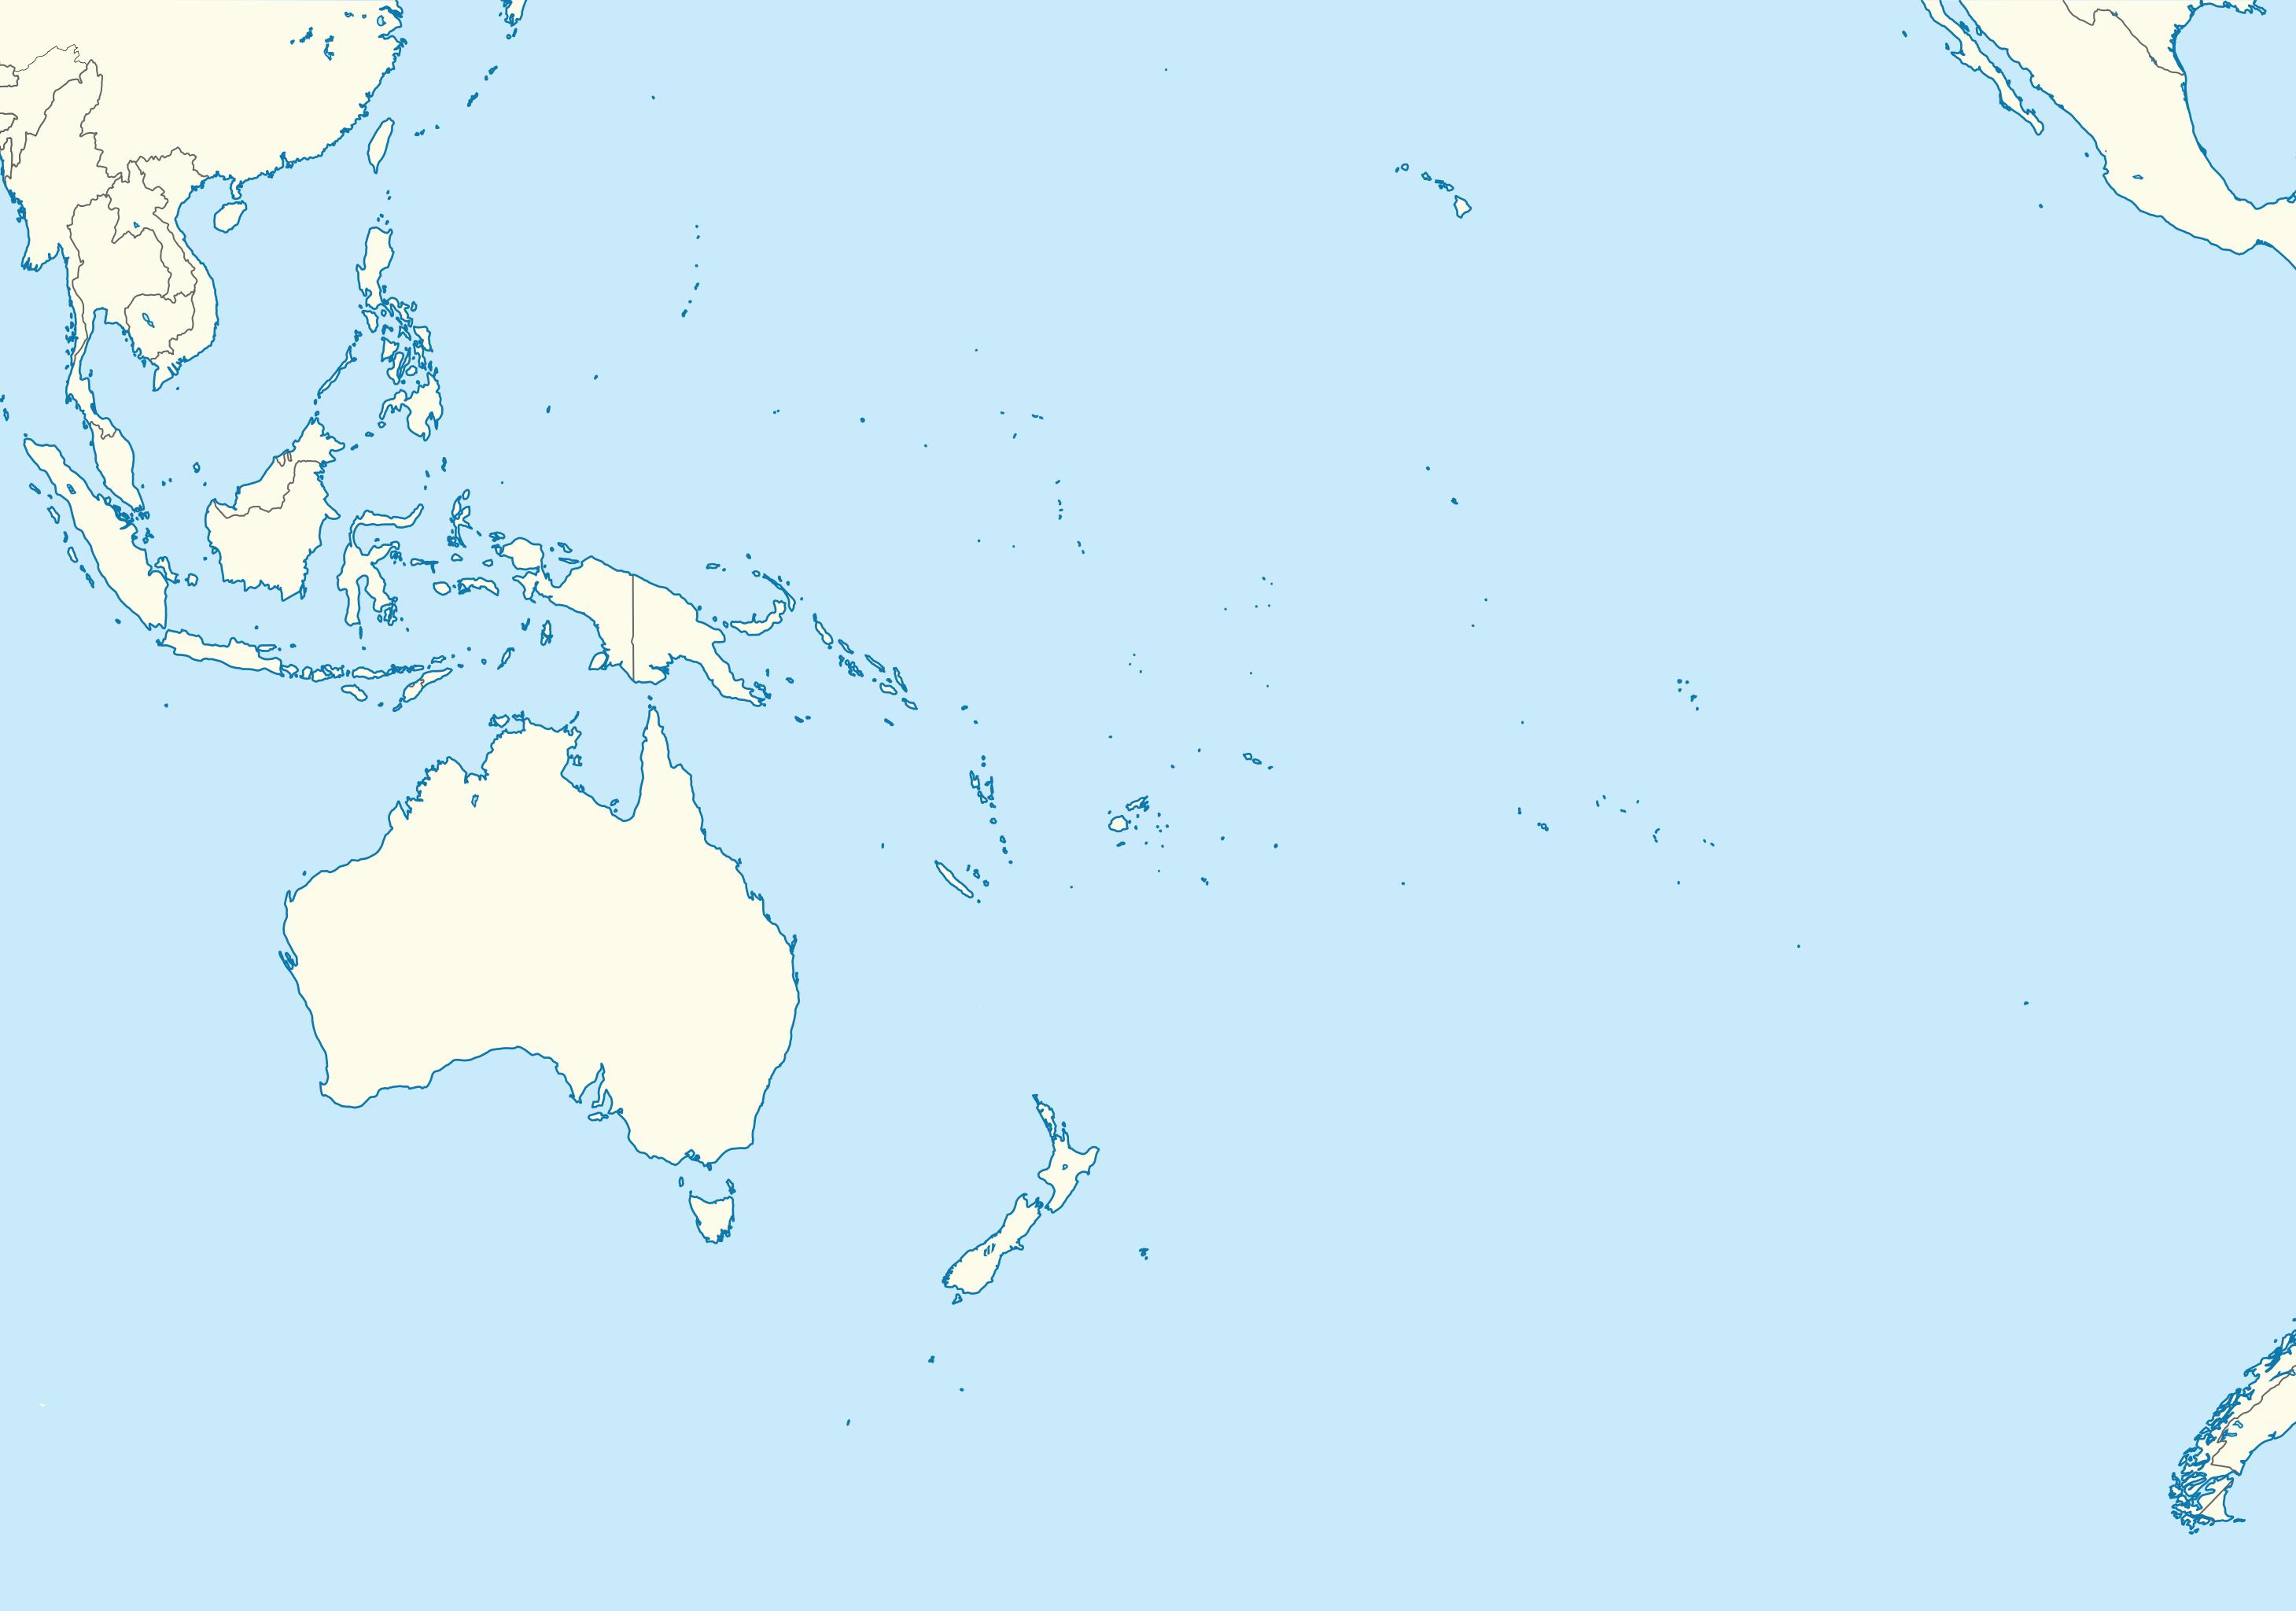 Blank Map Of Oceania FileOceania full blank map